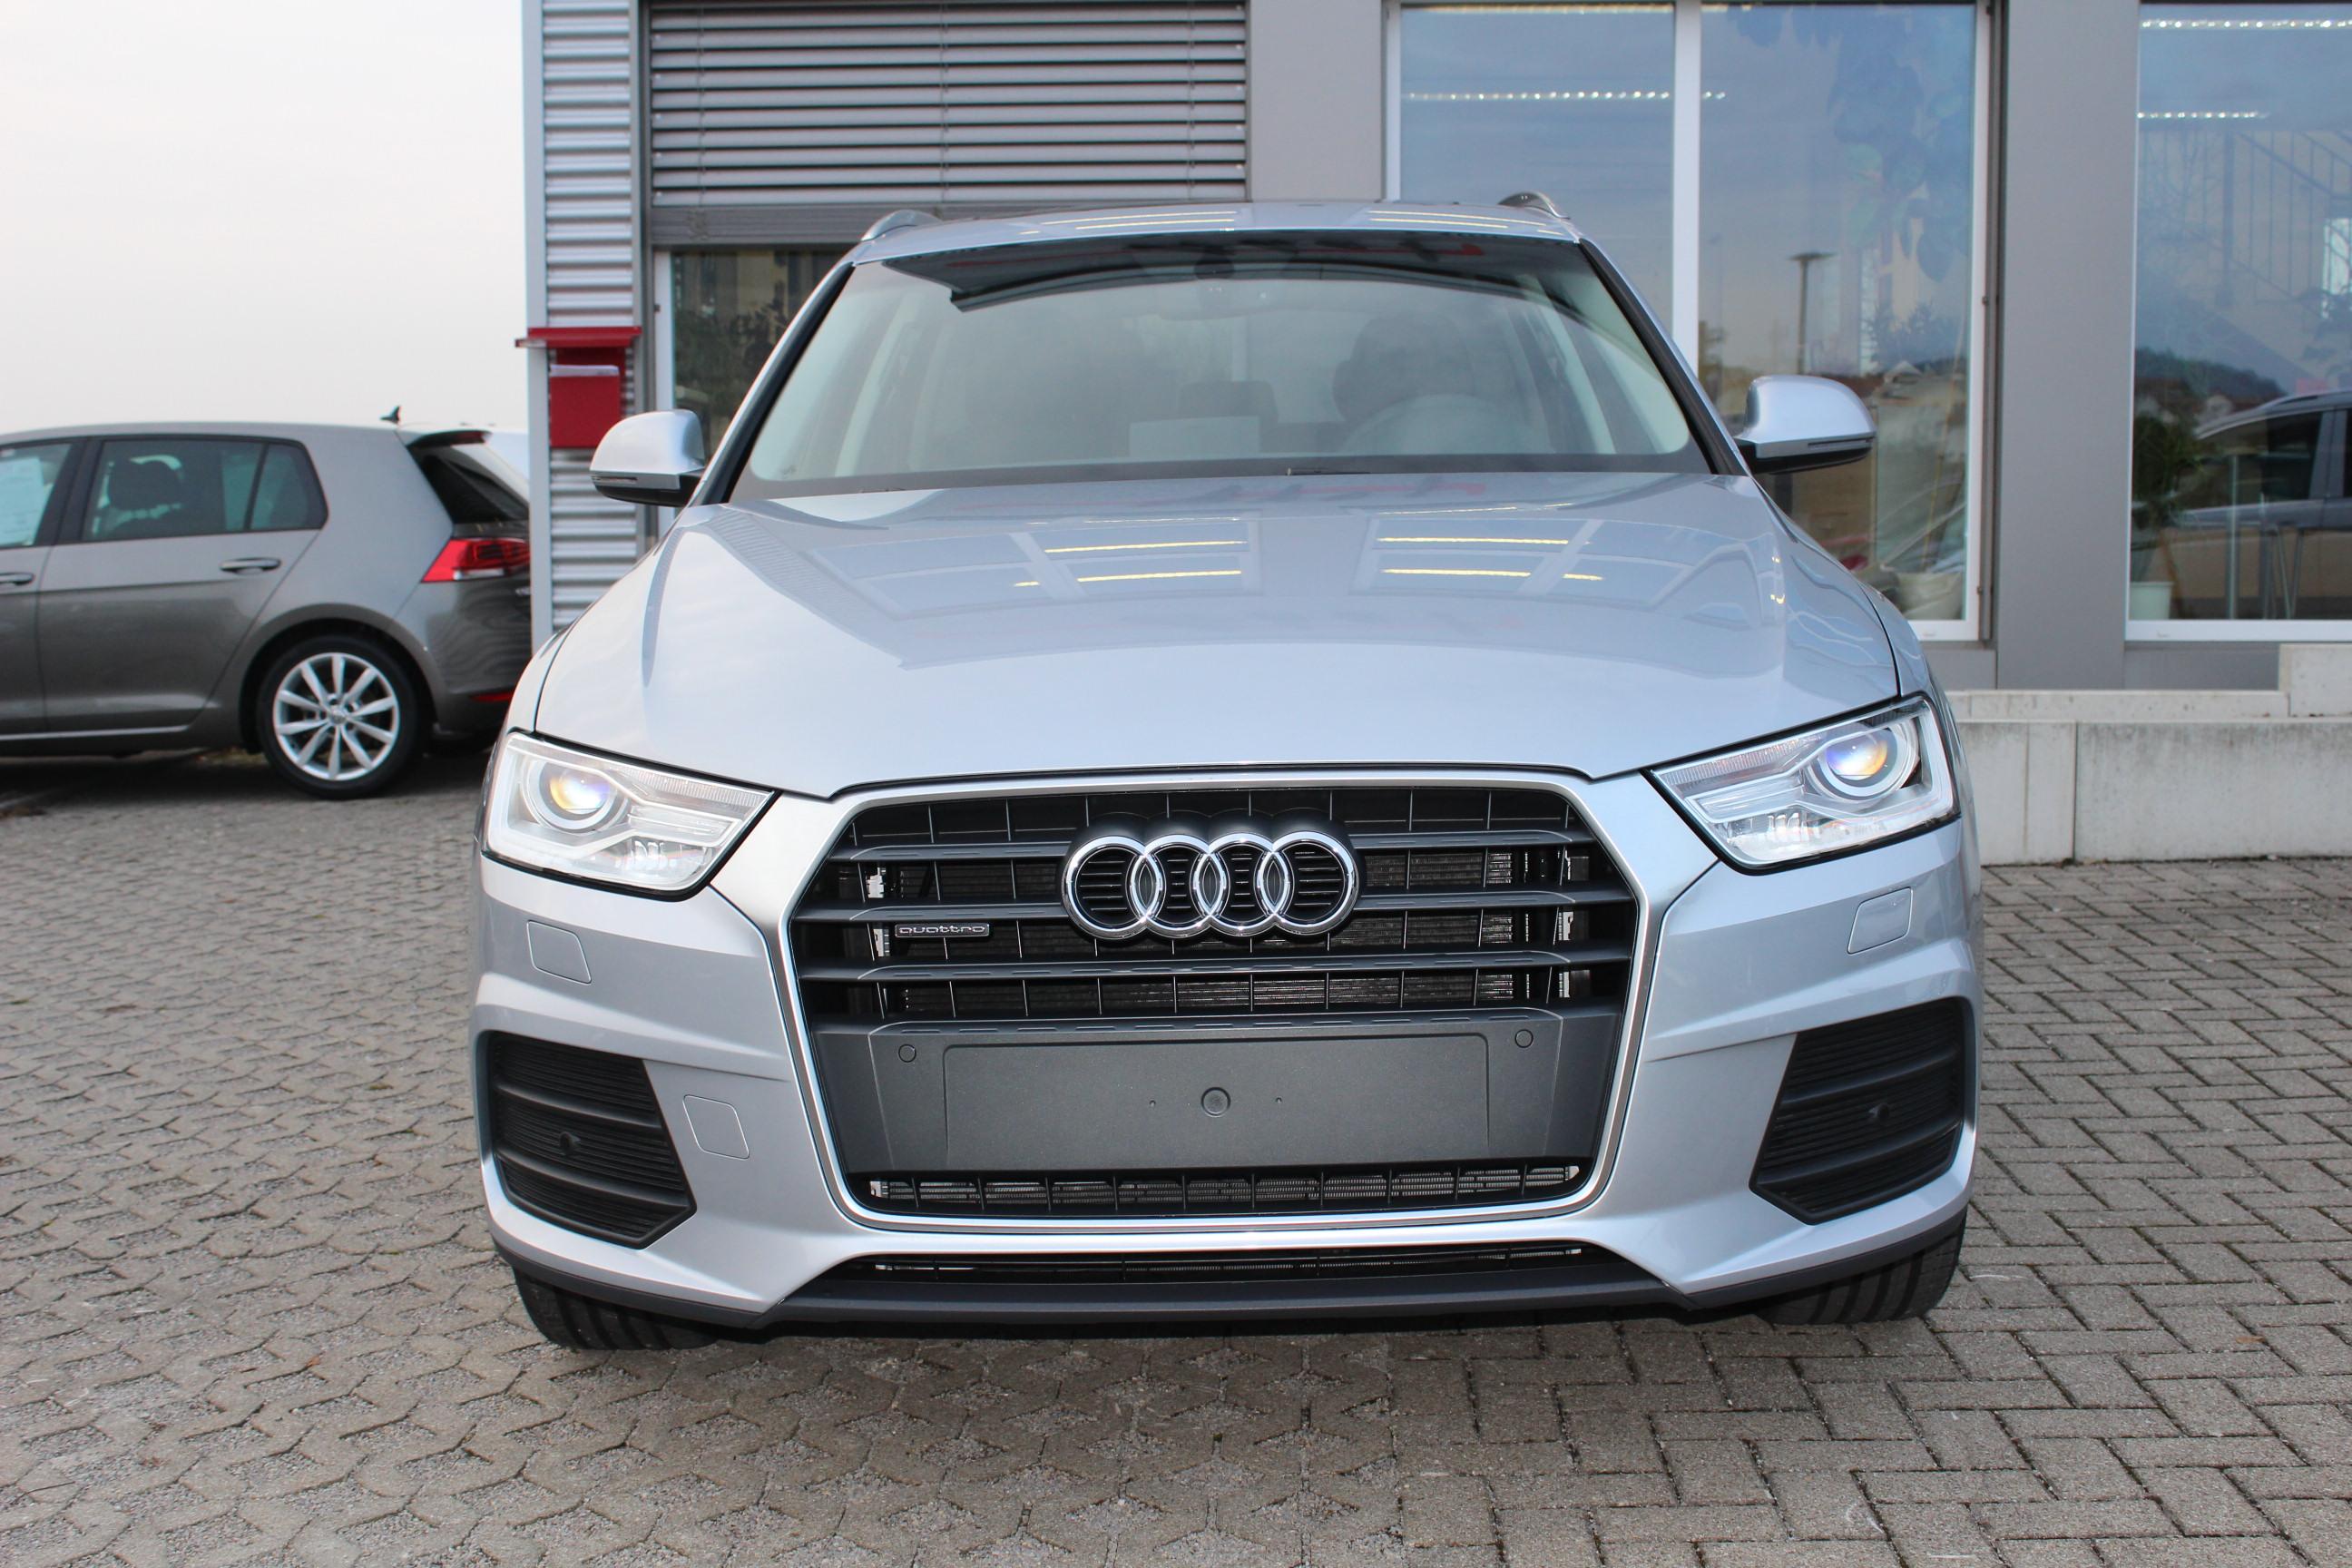 Audi Q3 2.0 TDI quattro allrad S-Tronic (Automatik) / Deutsche Neufahrzeuge und EU-Neufahrzeuge – Aha! Fahrzeughandel GmbH in Althengstett